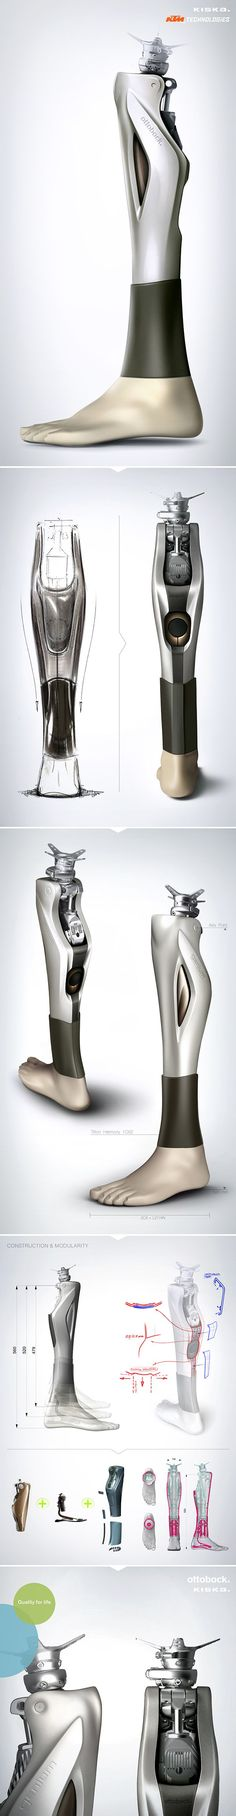 Ottobock Prosthetic Cover / Designed by KISKA on Industrial Design Served